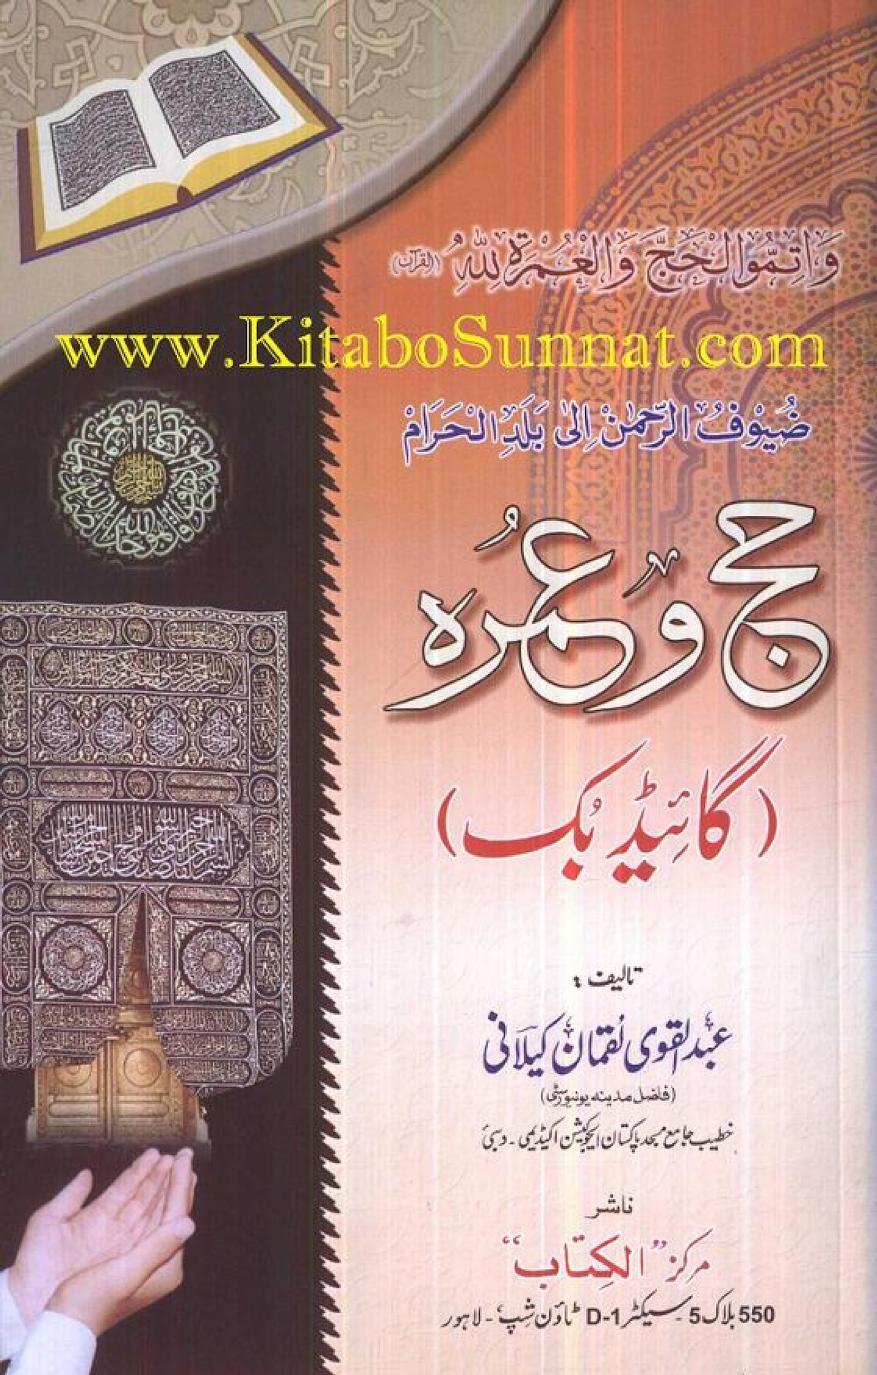 HAJJ AUR UMRAH GUIDE ISLAMIC URDU BOOK.pdf Umrah guide